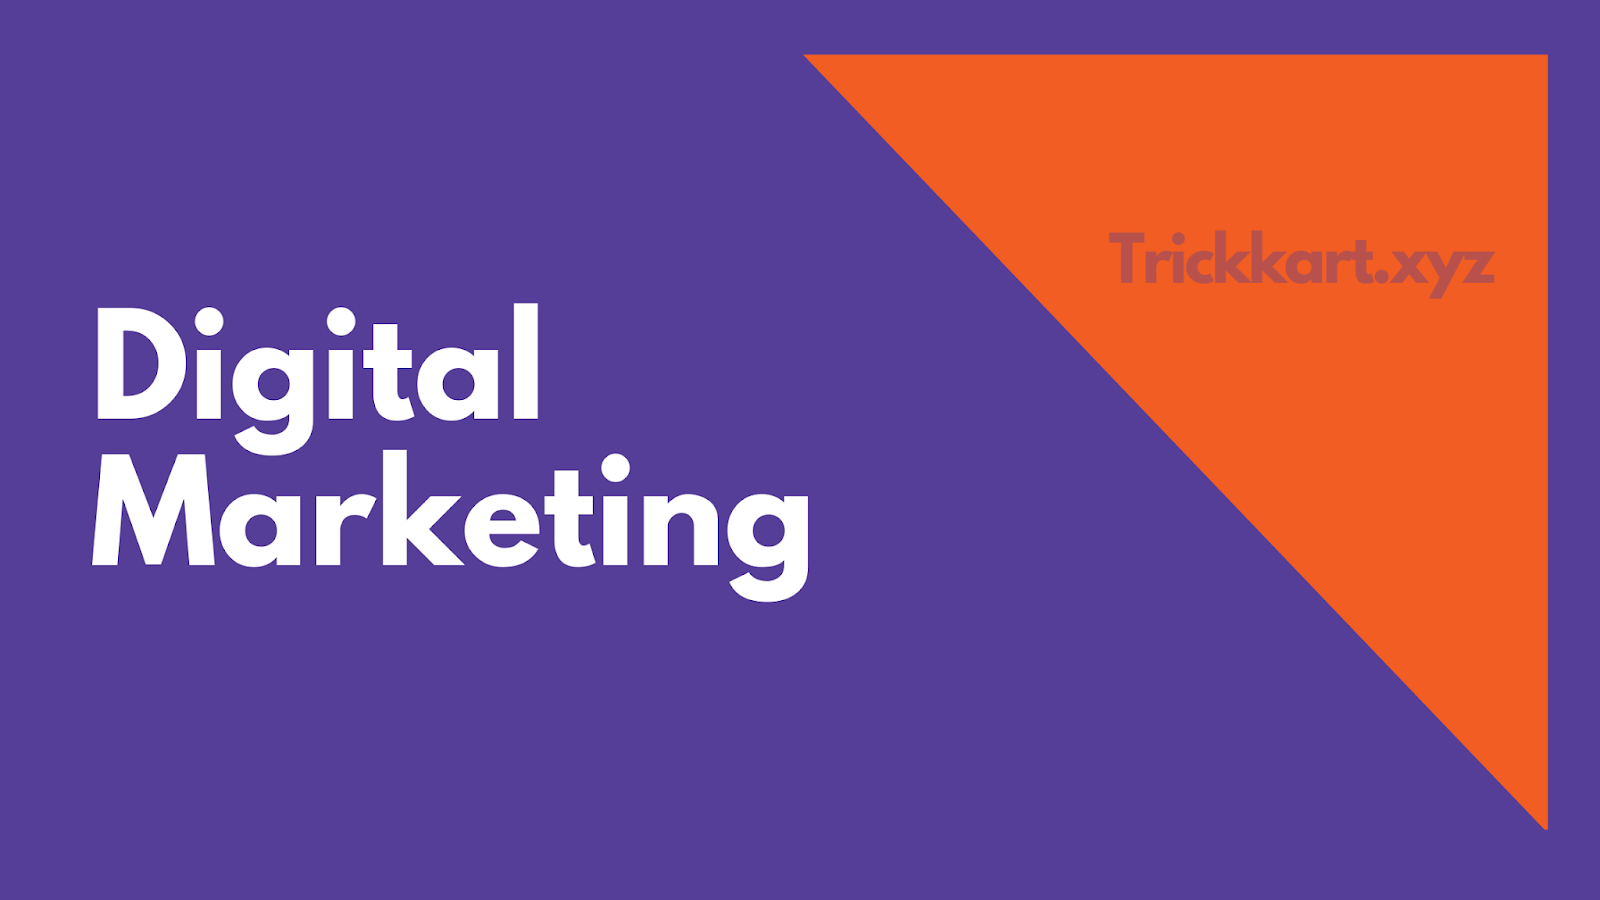 Digital Marketing- what is digital marketing